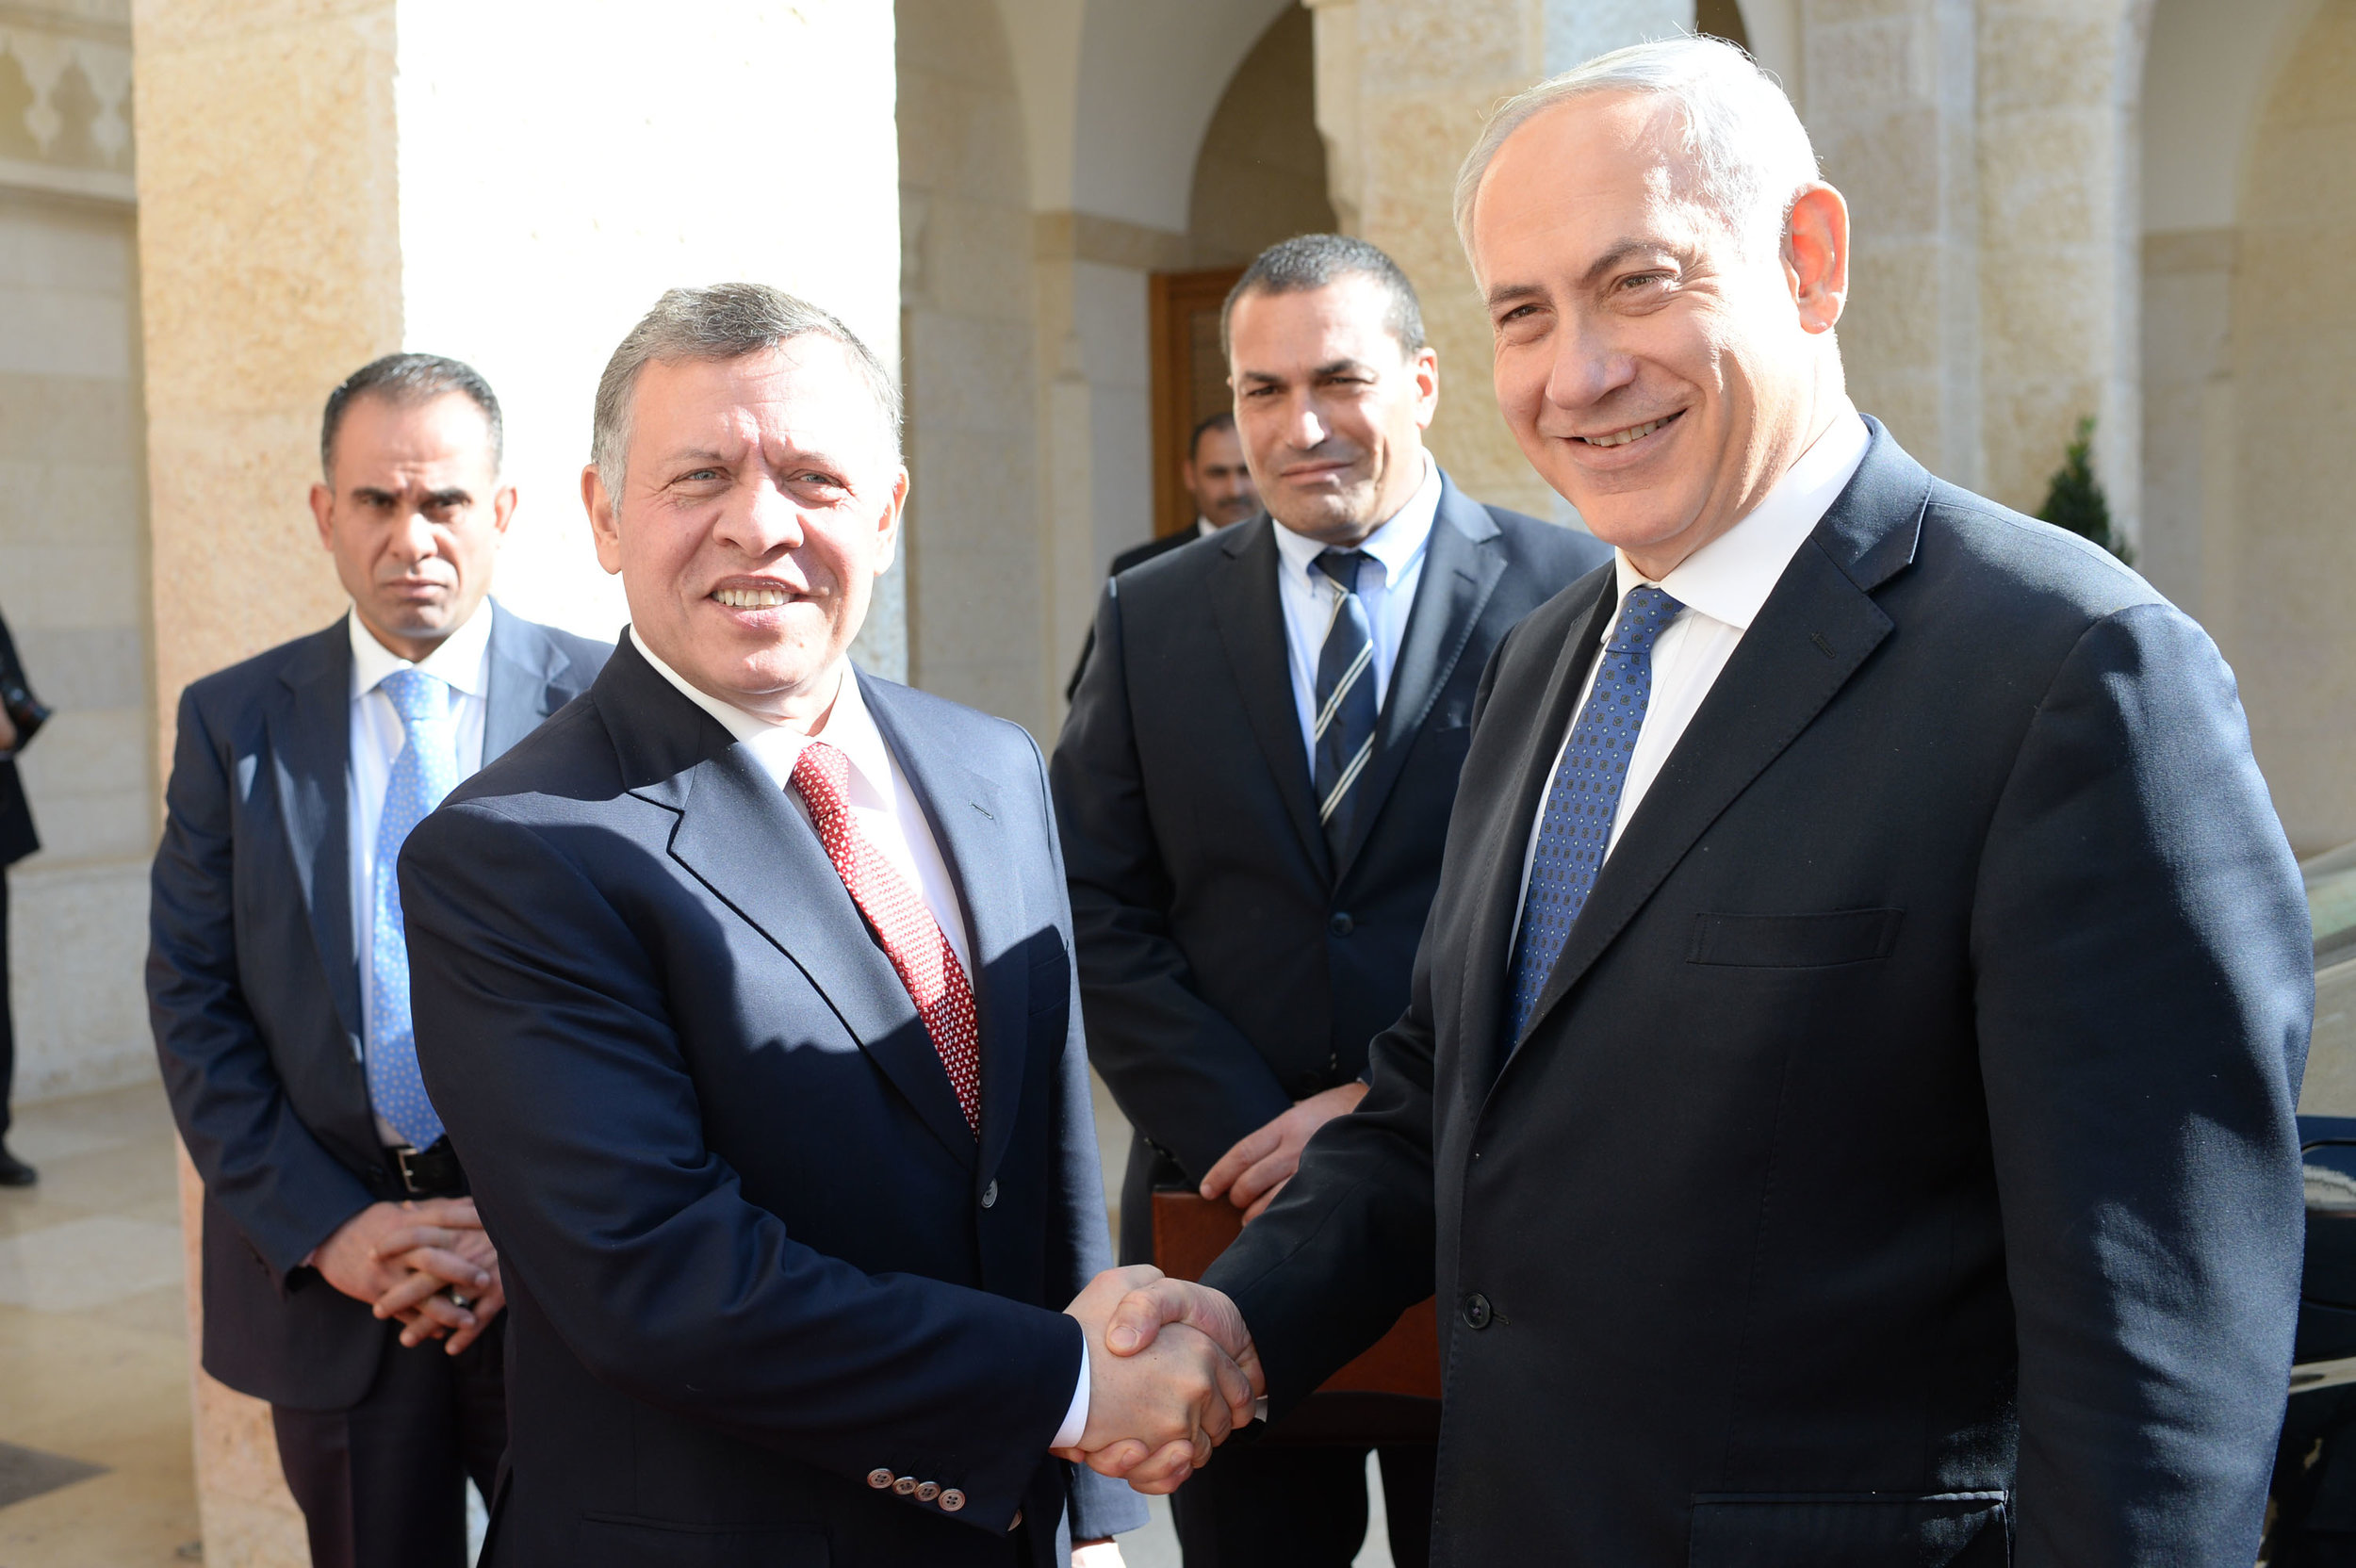 Israeli Prime Minister Benjamin Netanyahu with Jordan's King Abdullah II in Amman, Jordan, Jan. 16, 2014. Credit: Kobi Gideon/GPO/FLASH90.